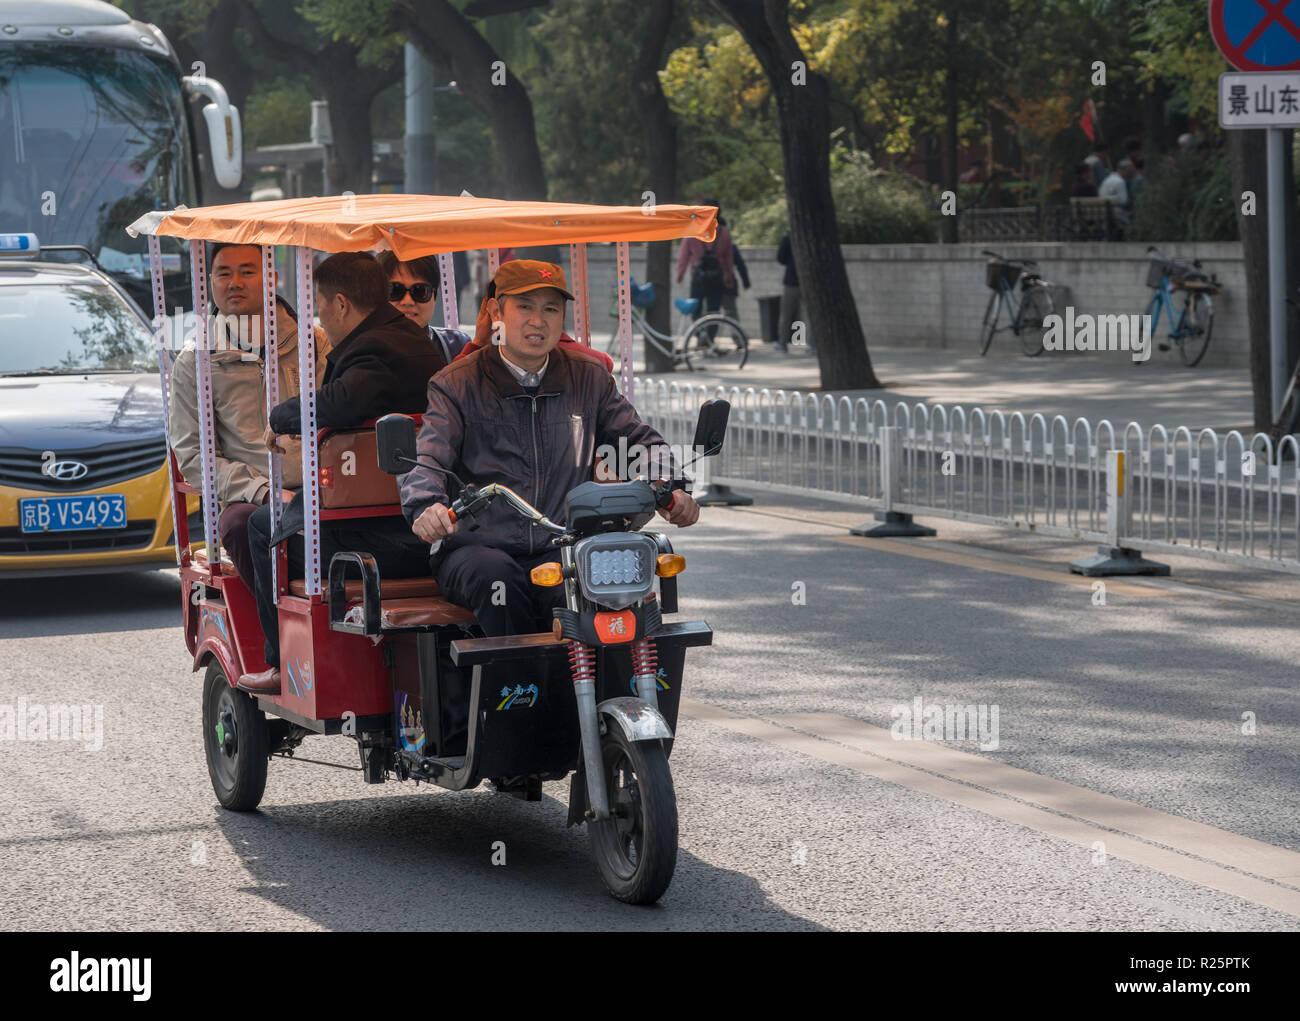 Rickshaw Bajaj Stock Photos & Rickshaw Bajaj Stock Images - Alamy